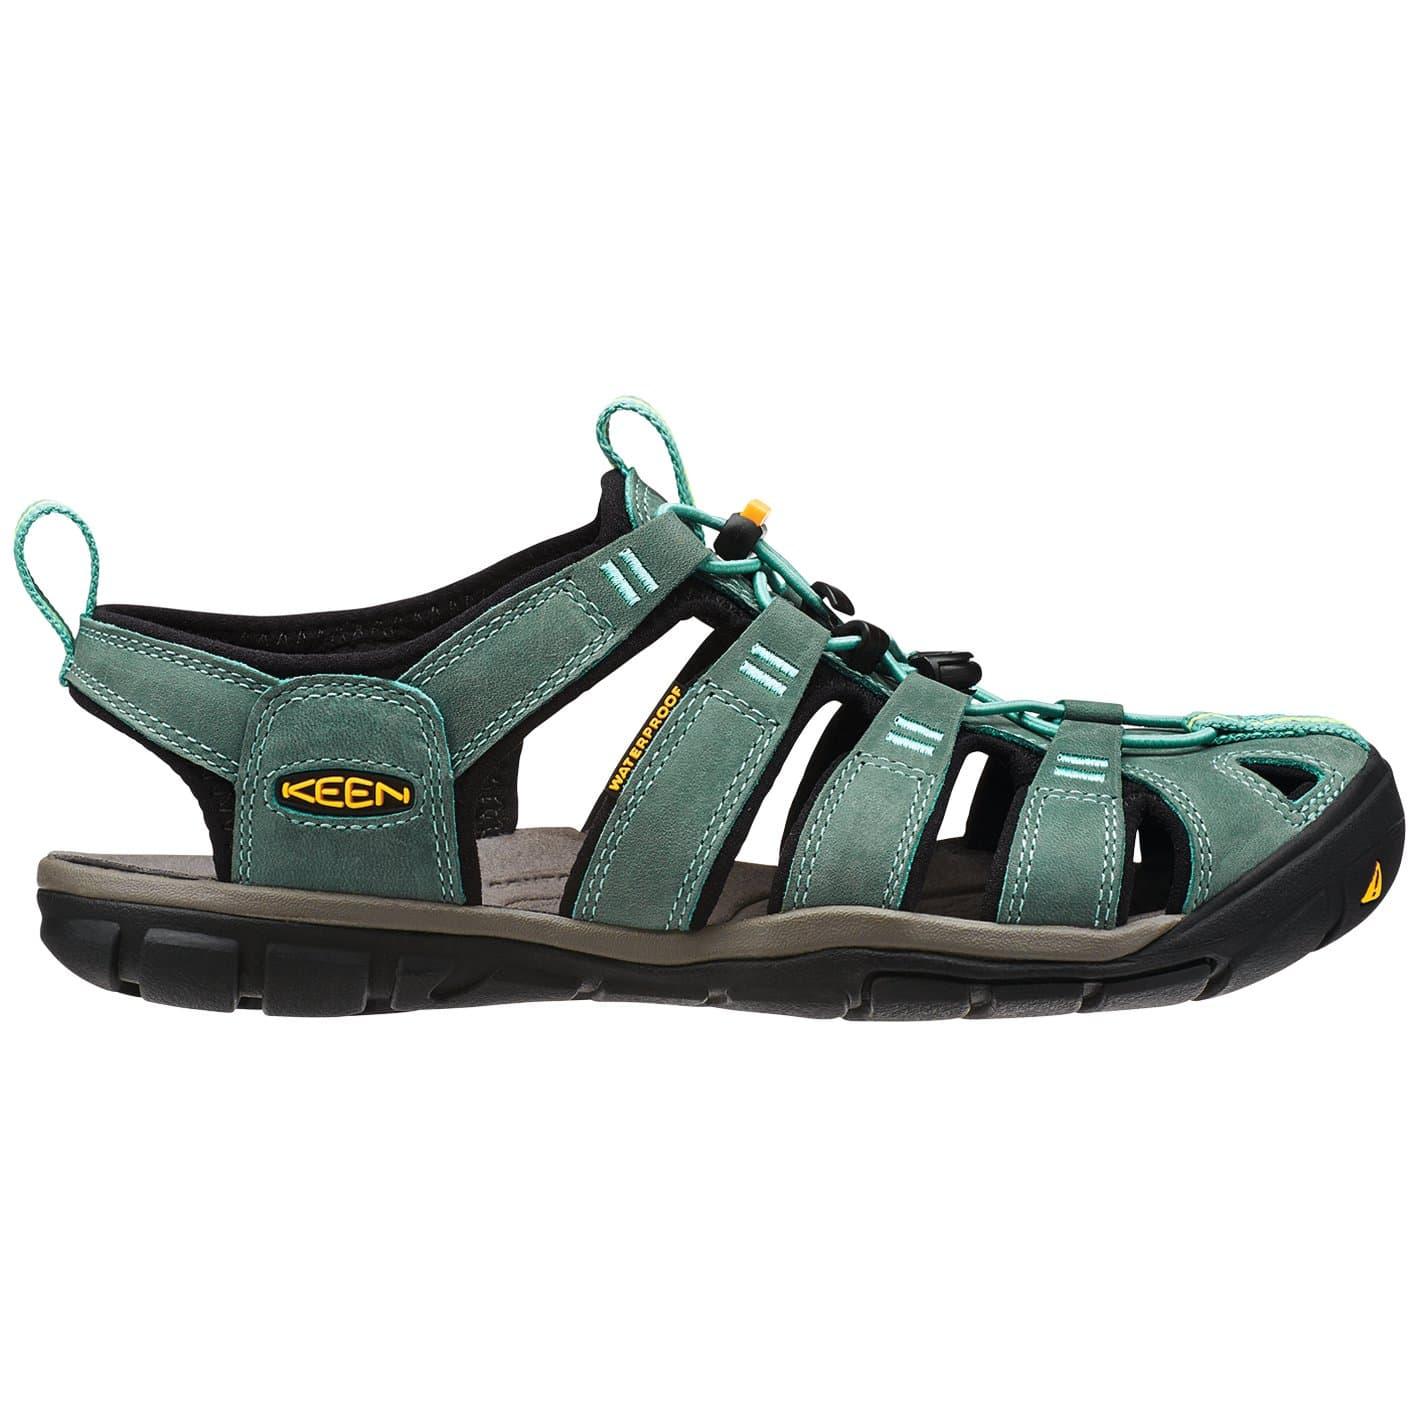 Keen Clearwater CNX Leather Sandali da uomo